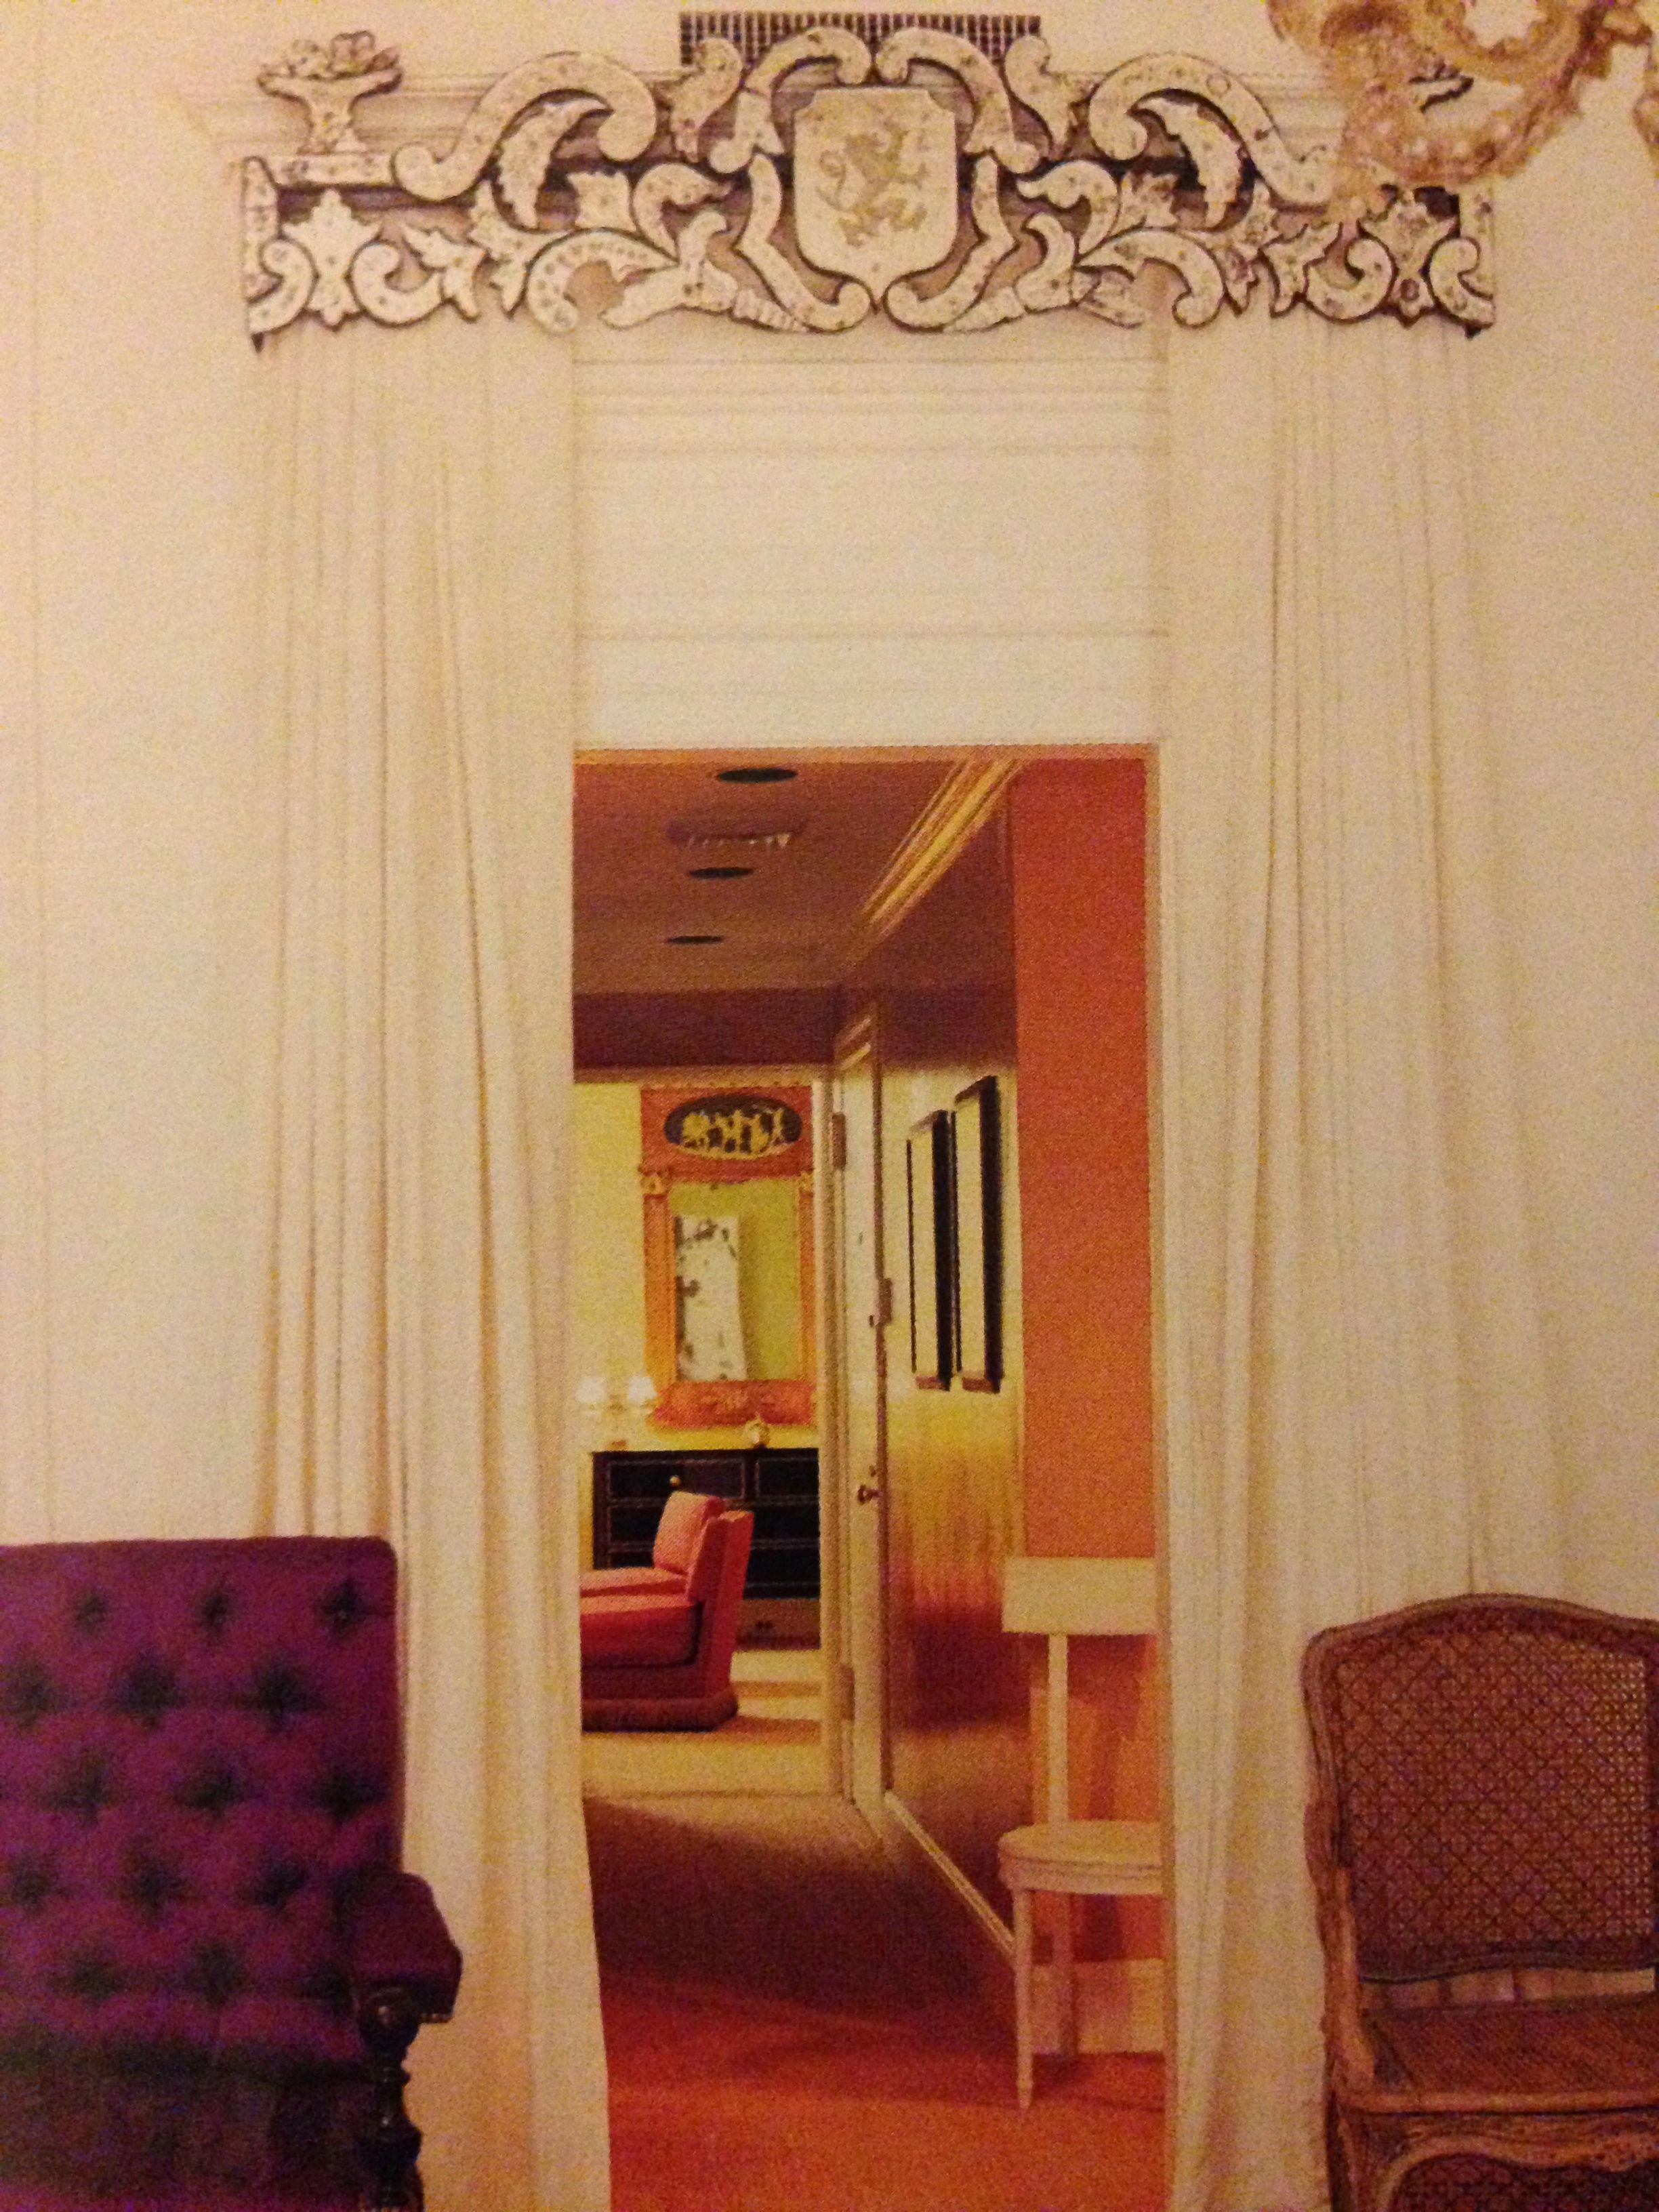 mirror pelmet for curtains for my bathroom drapes pinterest